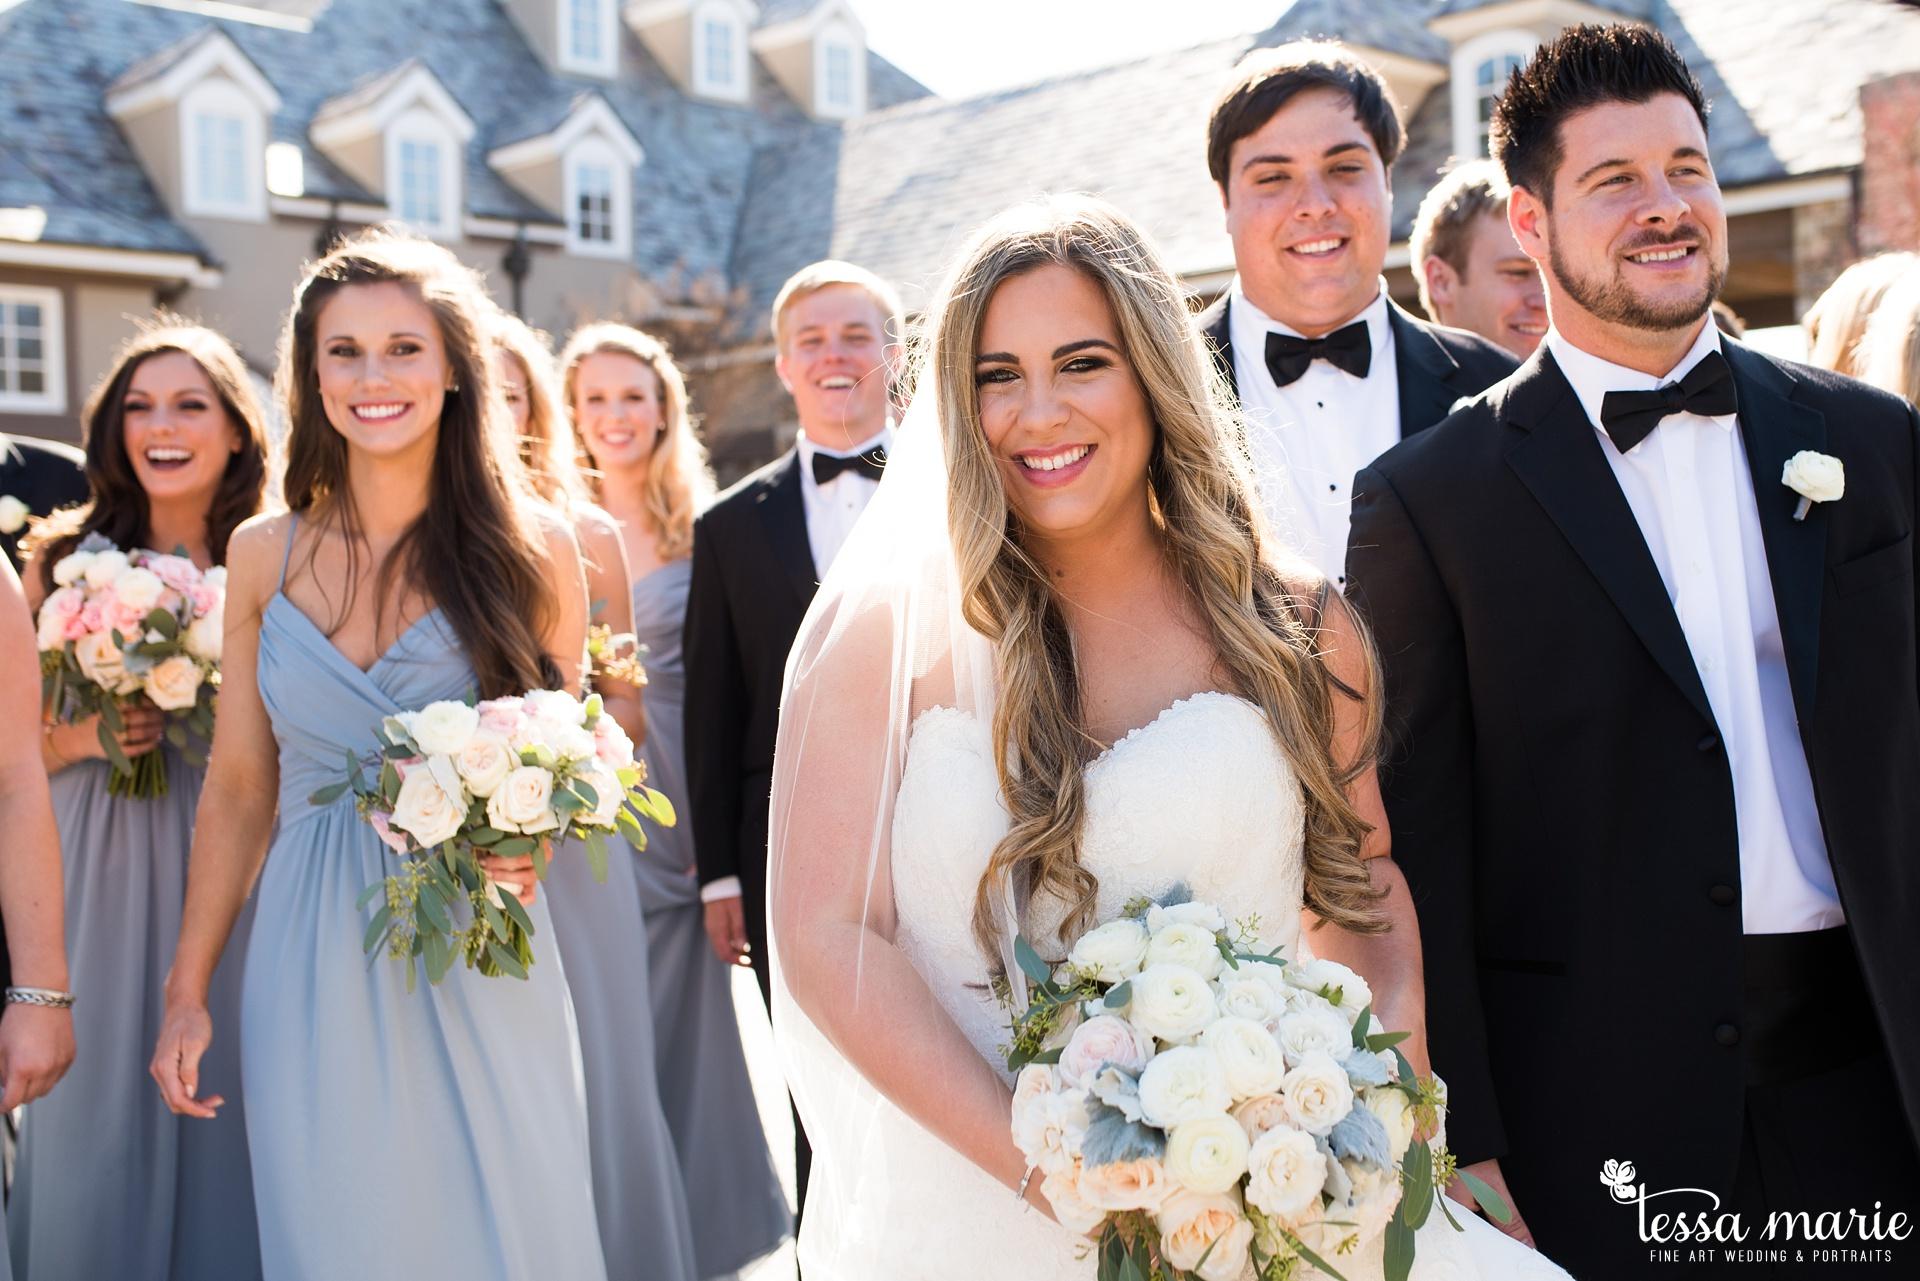 tessa_marie_legacy_moments_storytelling_candid_emotionally_driven_wedding_photographer_atlanta_wedding_photography_st_ives_country_club_wedding_boukates_bridals_by_lori_0025